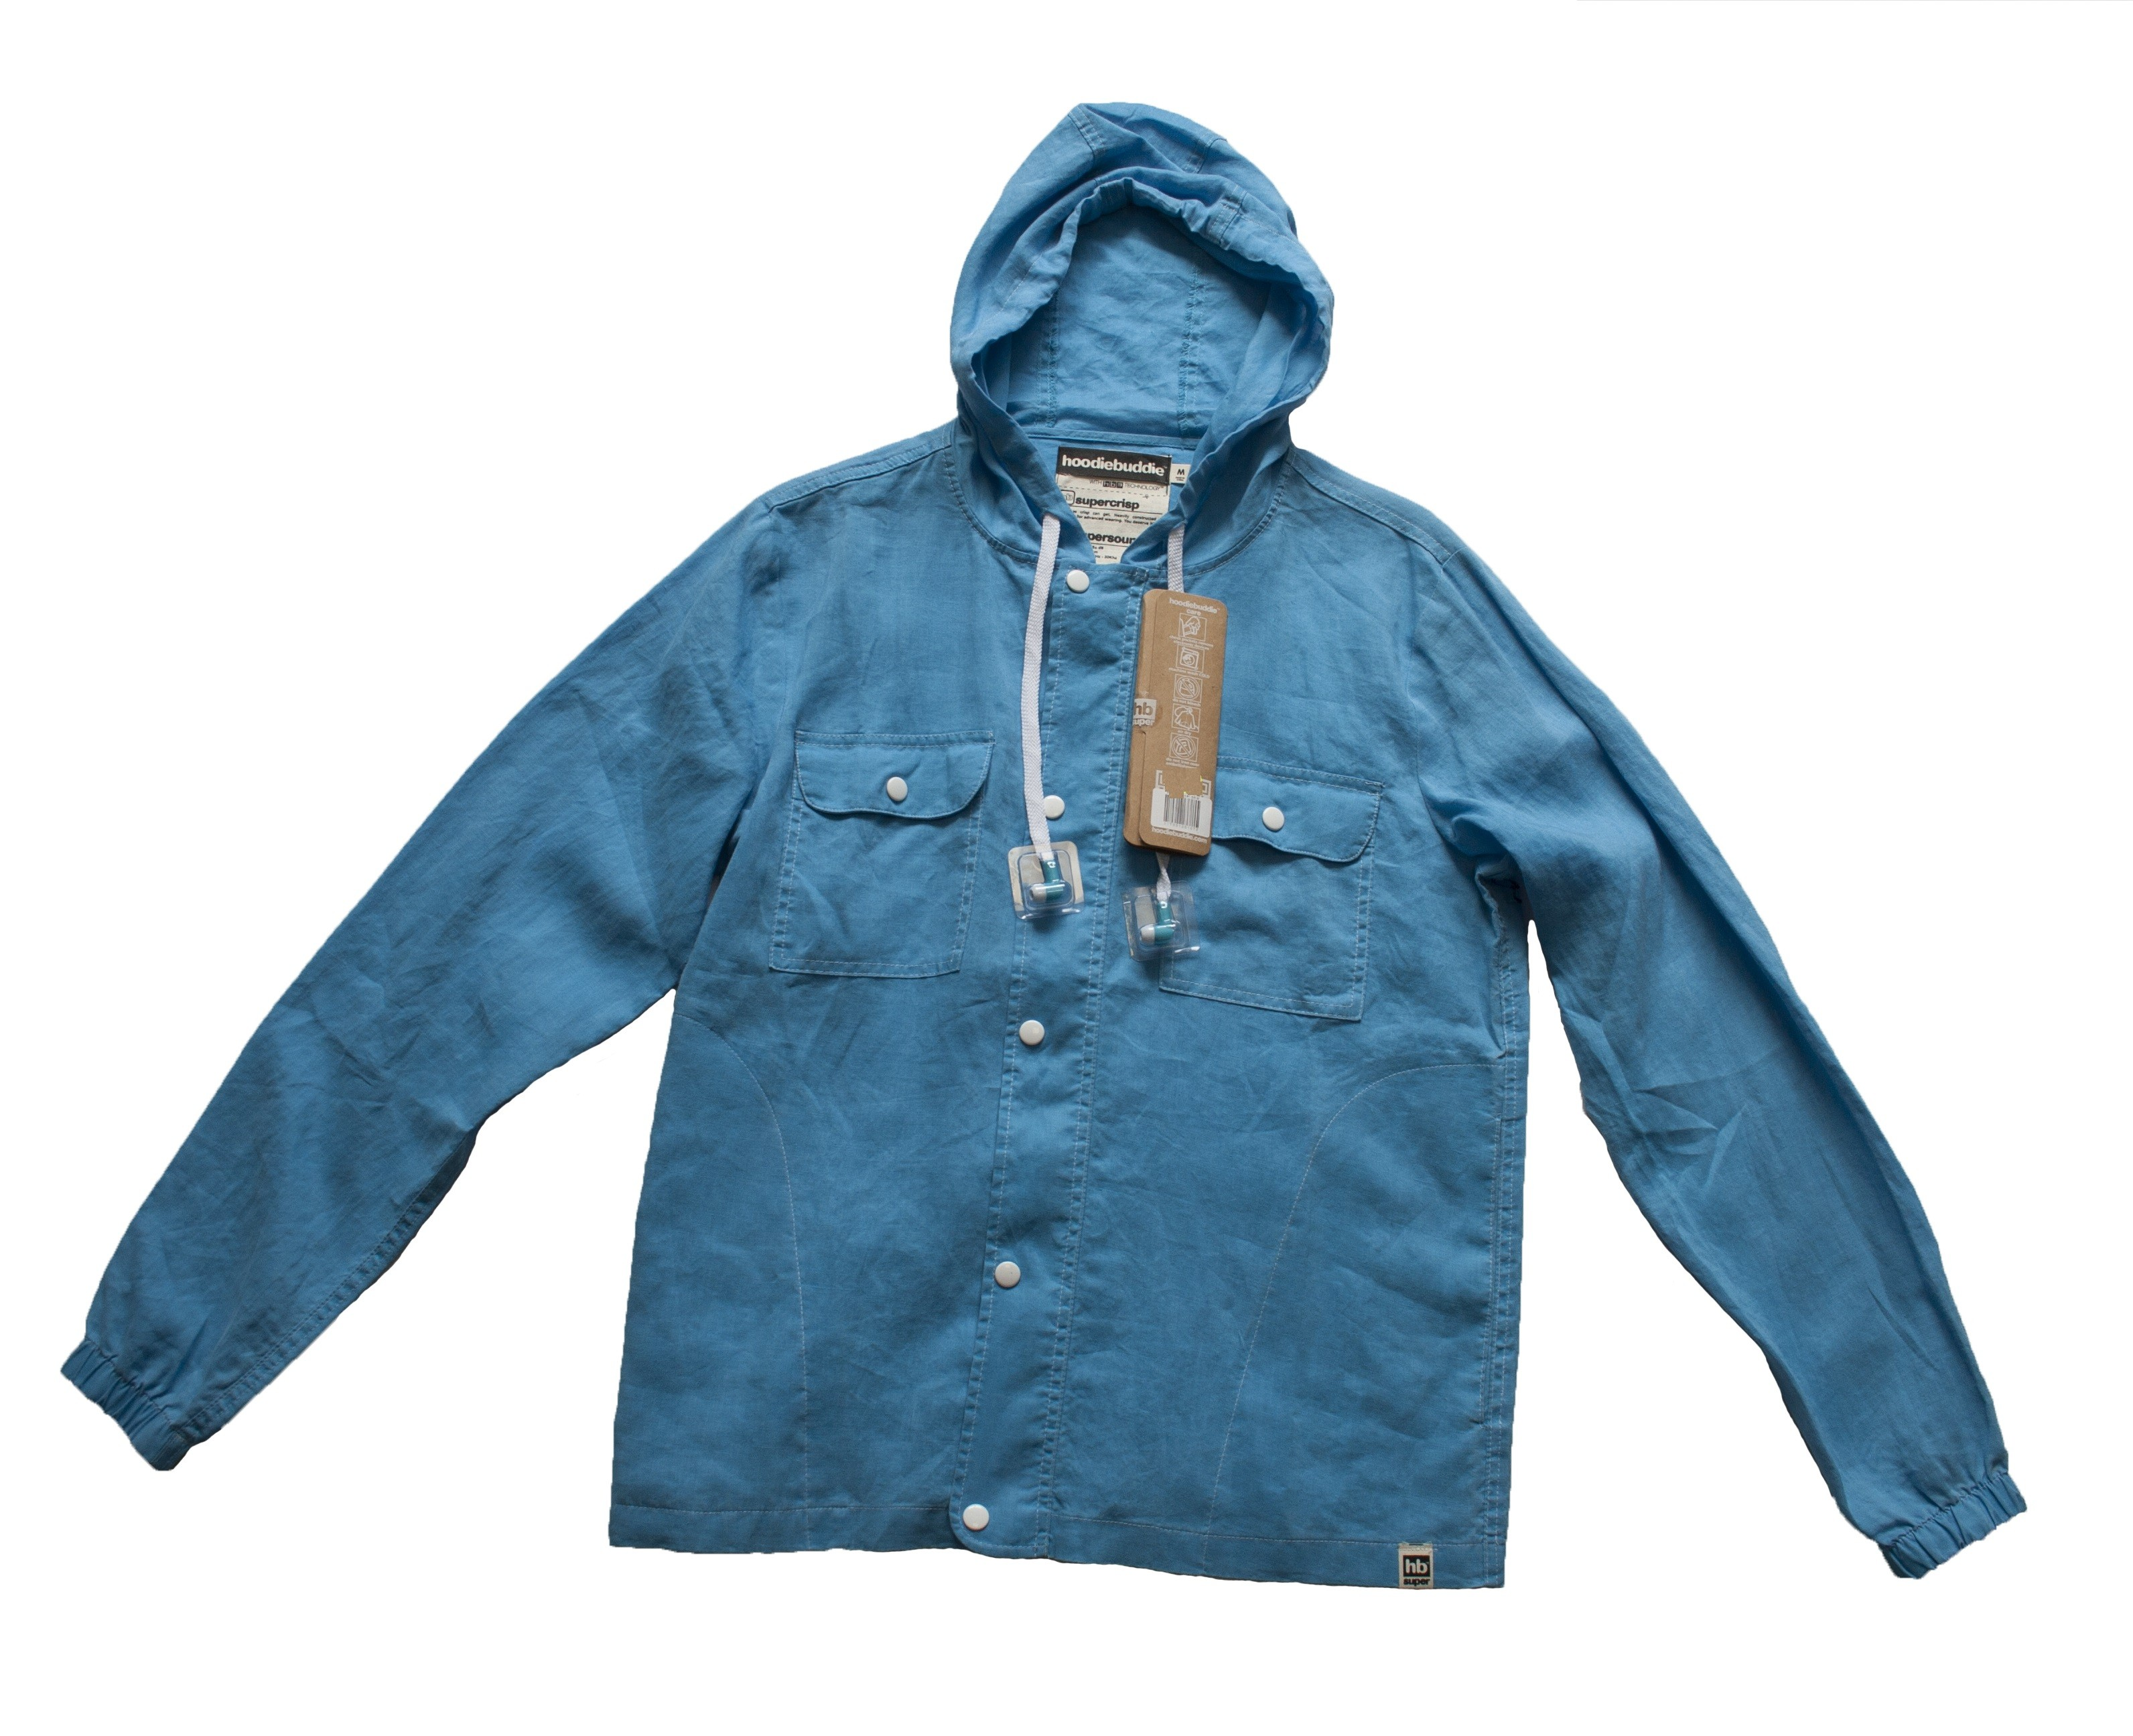 HOODIE BUDDIE Senior Full Zip Shirt Variation #1